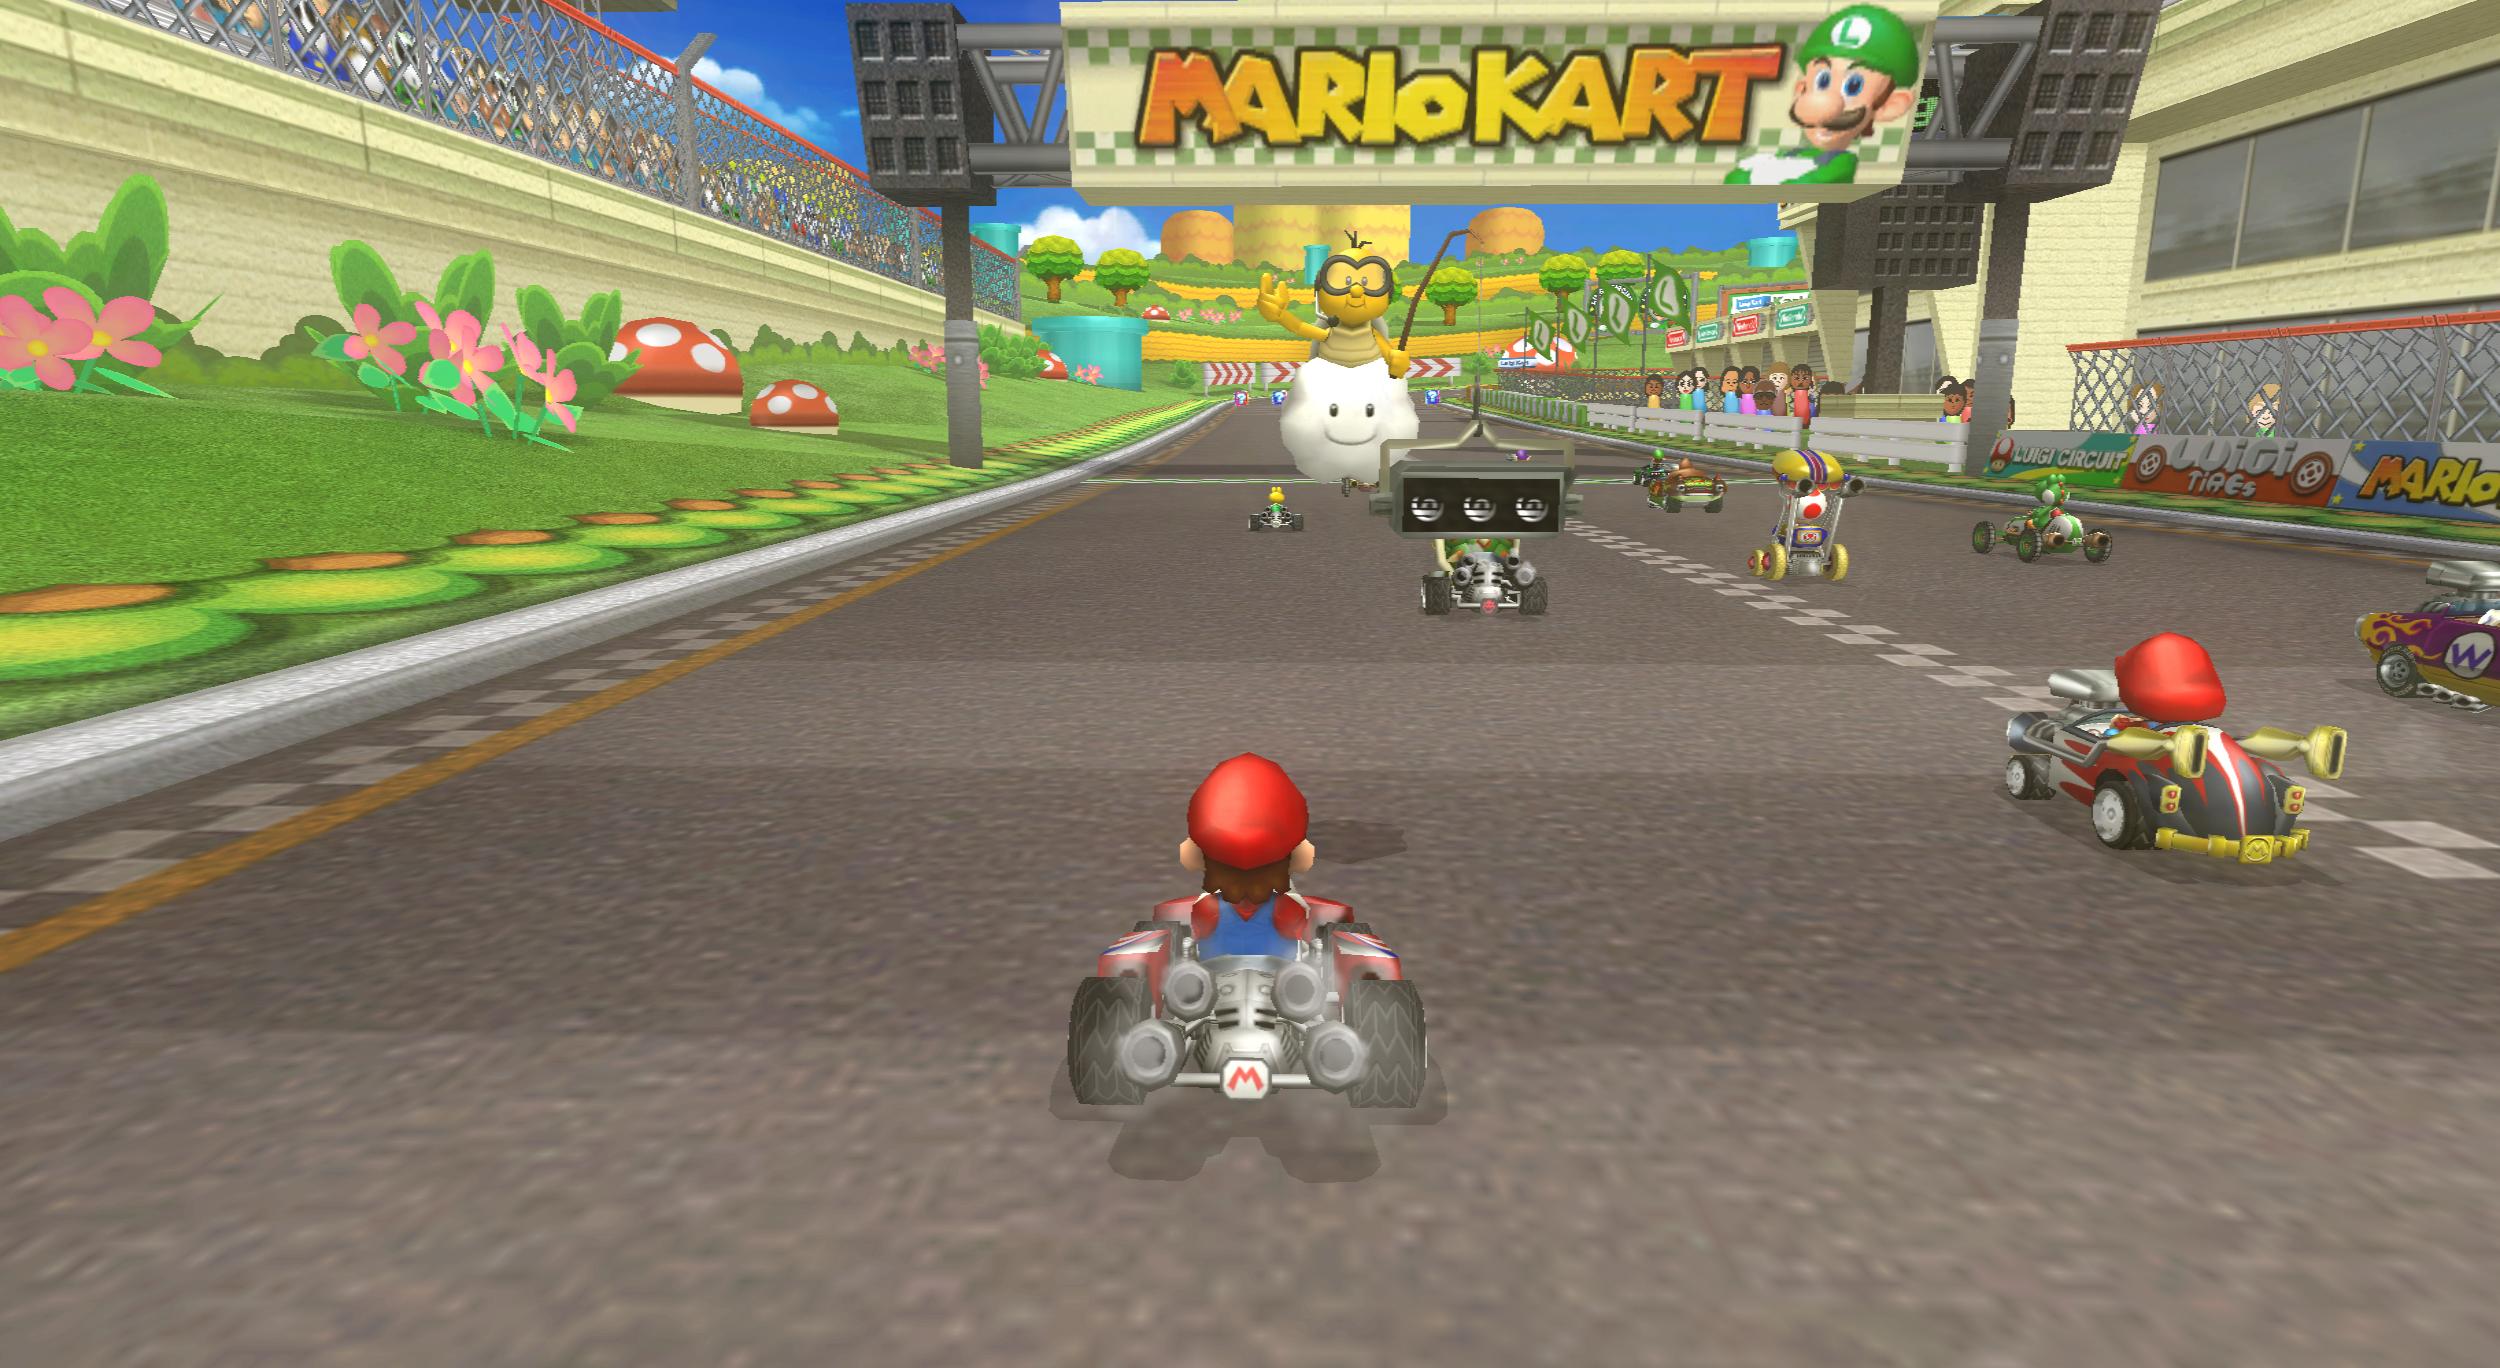 Mario Kart Wii Wii Walkthrough Snes Mario Circuit 3 Youtube